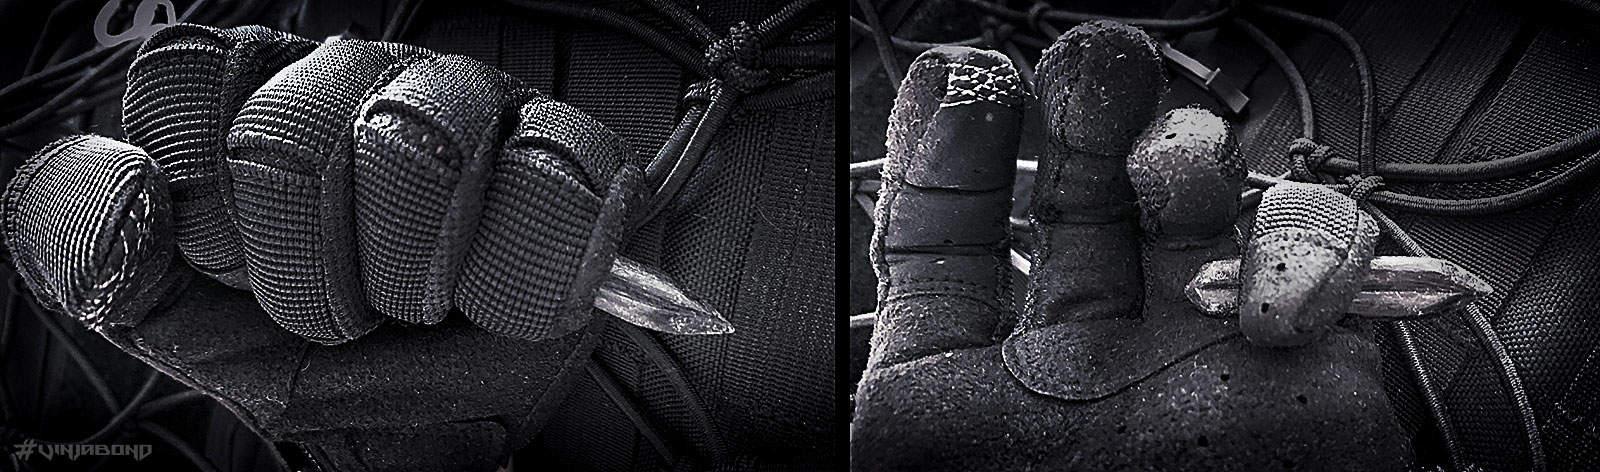 Carbon Fiber Dagger Grip /// VINJABOND